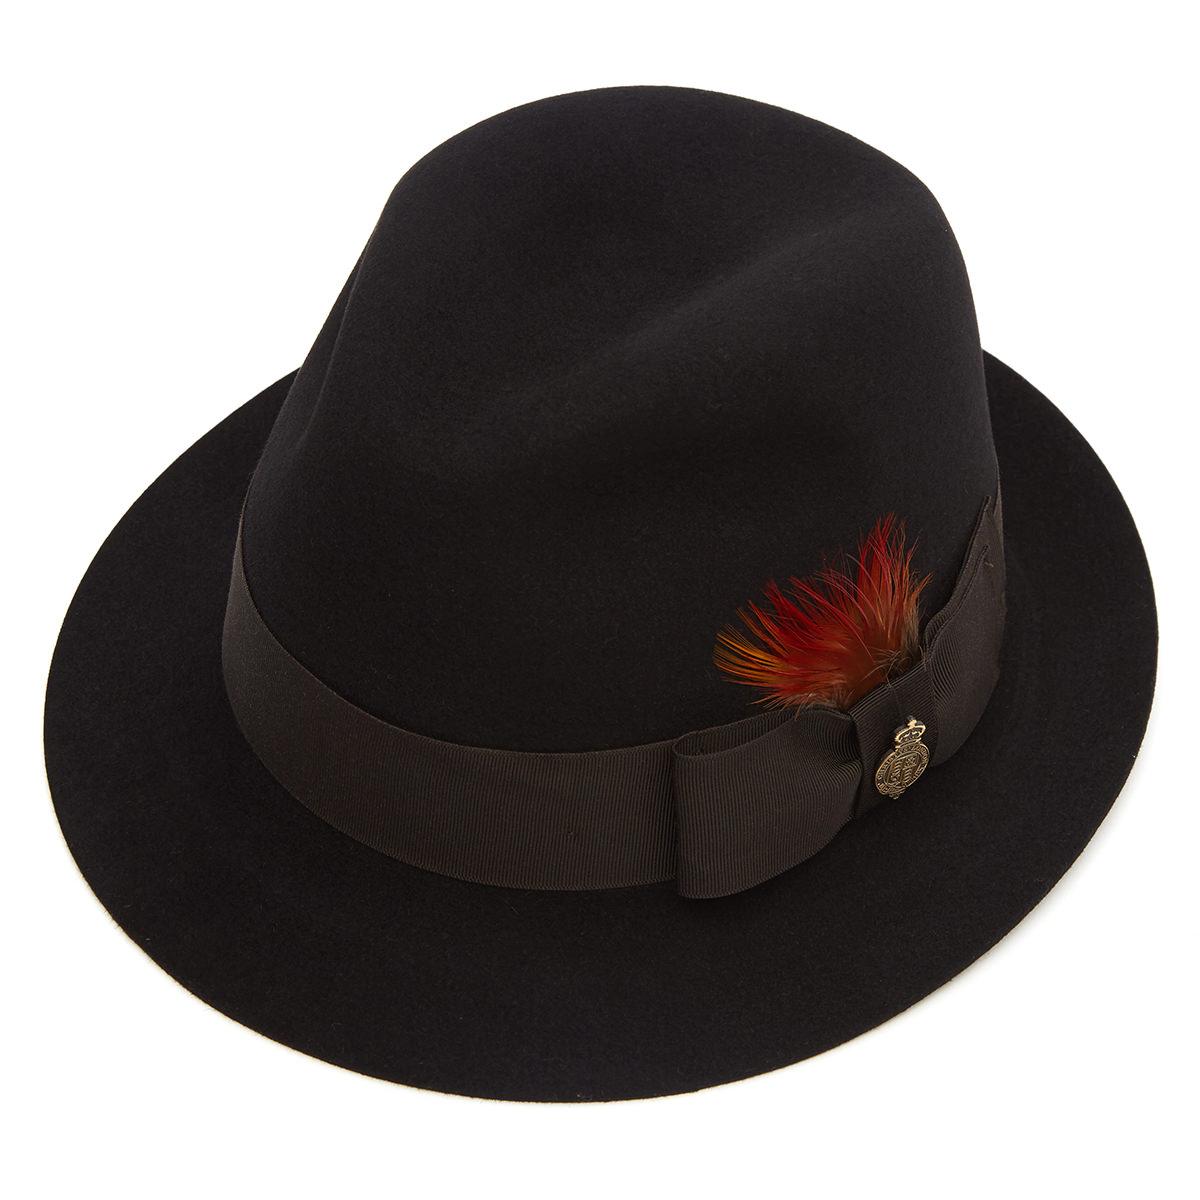 Fulmer Fur Felt Trilby Hat Black S